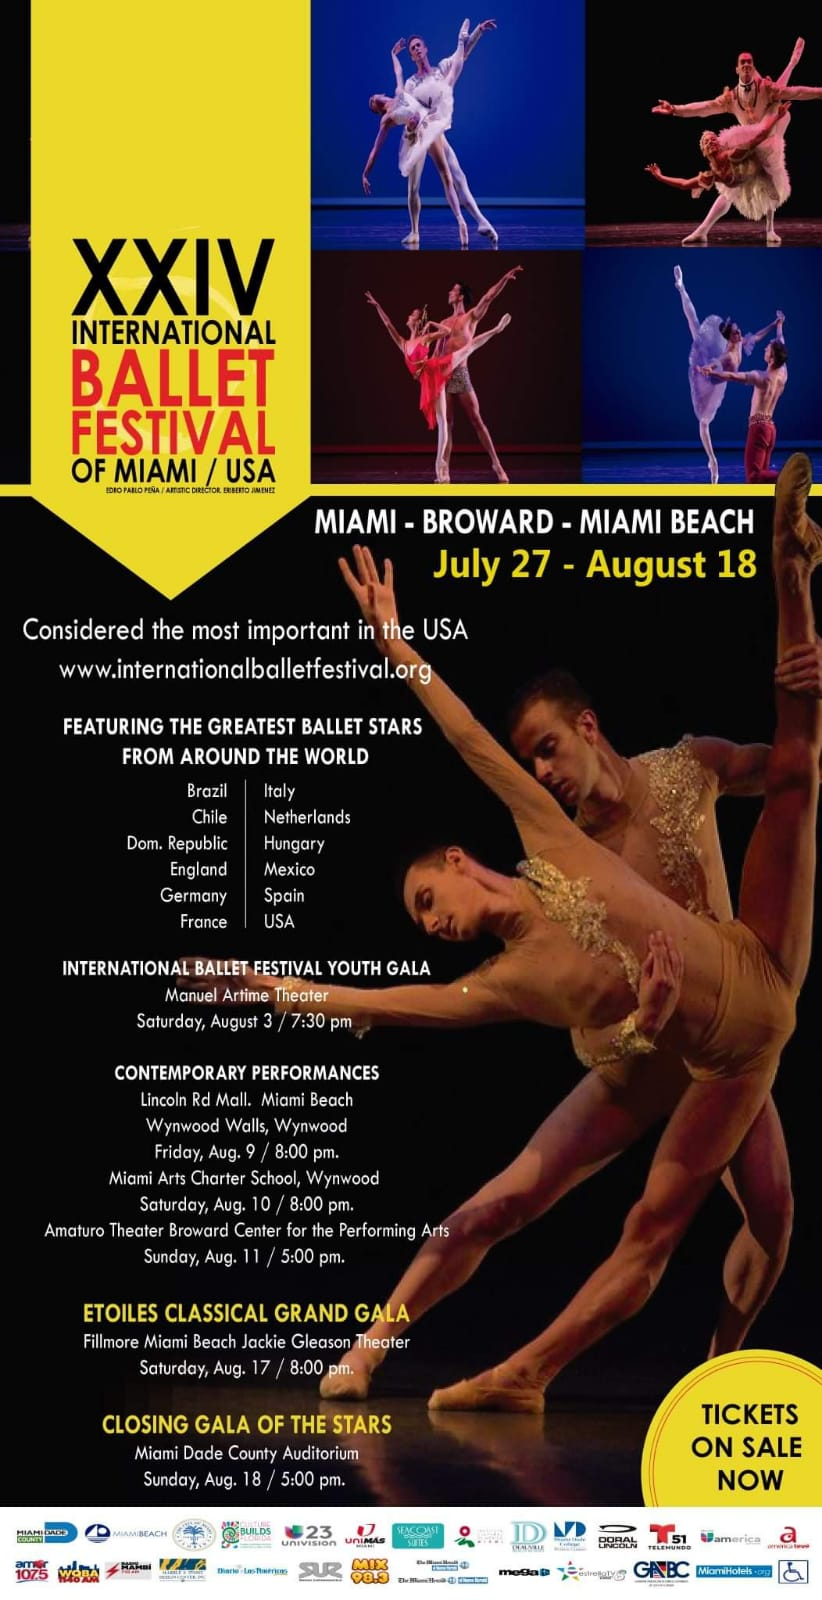 INTERNATIONAL BALLET FESTIVAL OF MIAMI, Florida